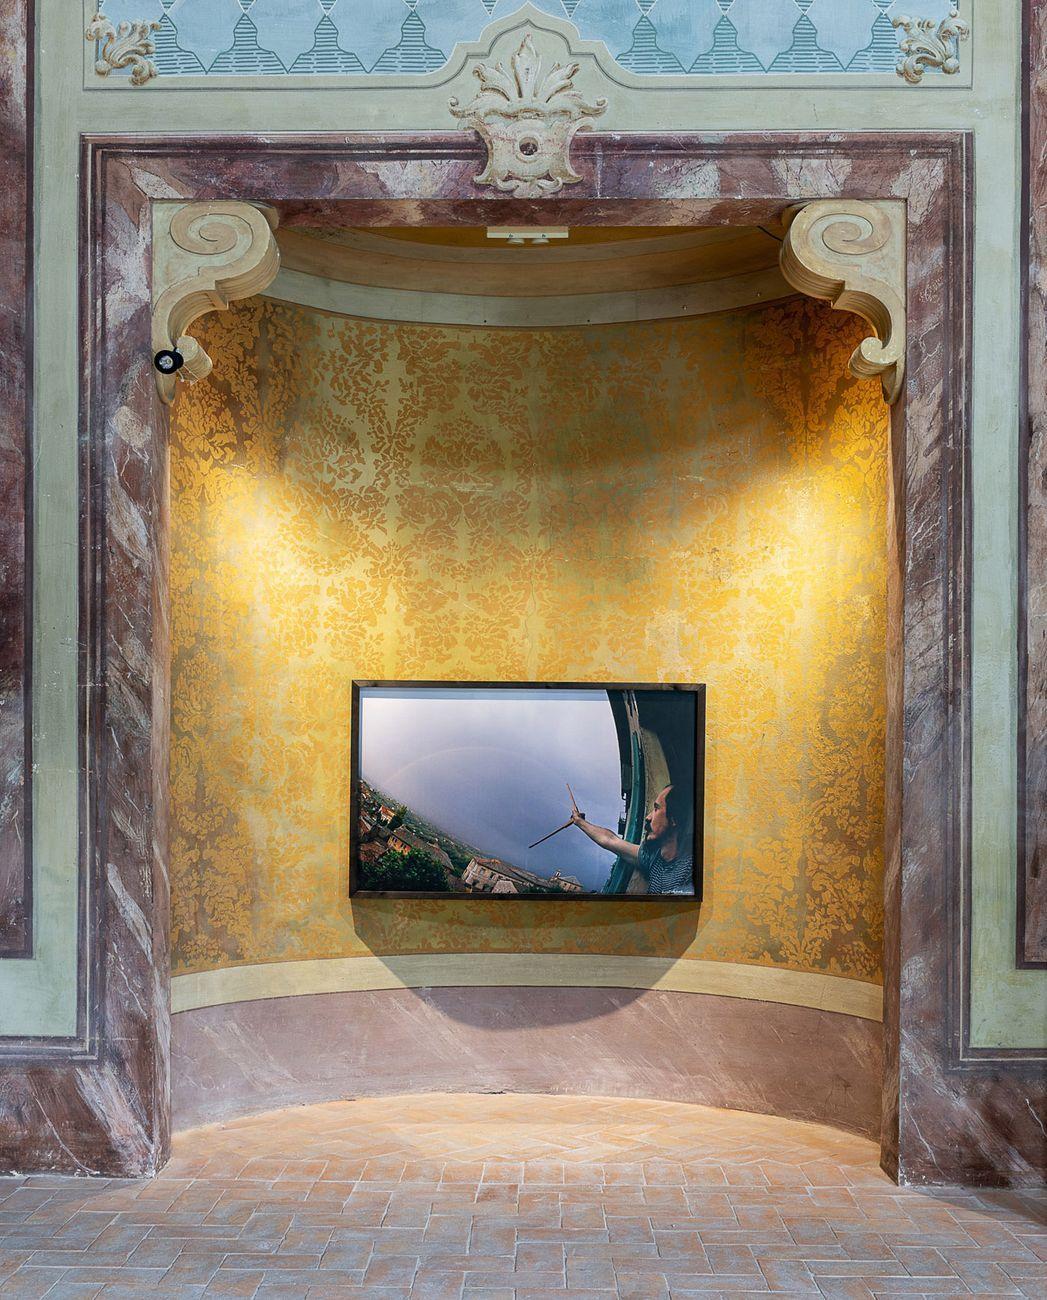 Luca Maria Patella. Exhibition view at Palazzina dei Giardini, Modena 2021. Photo © Rolando Paolo Guerzoni